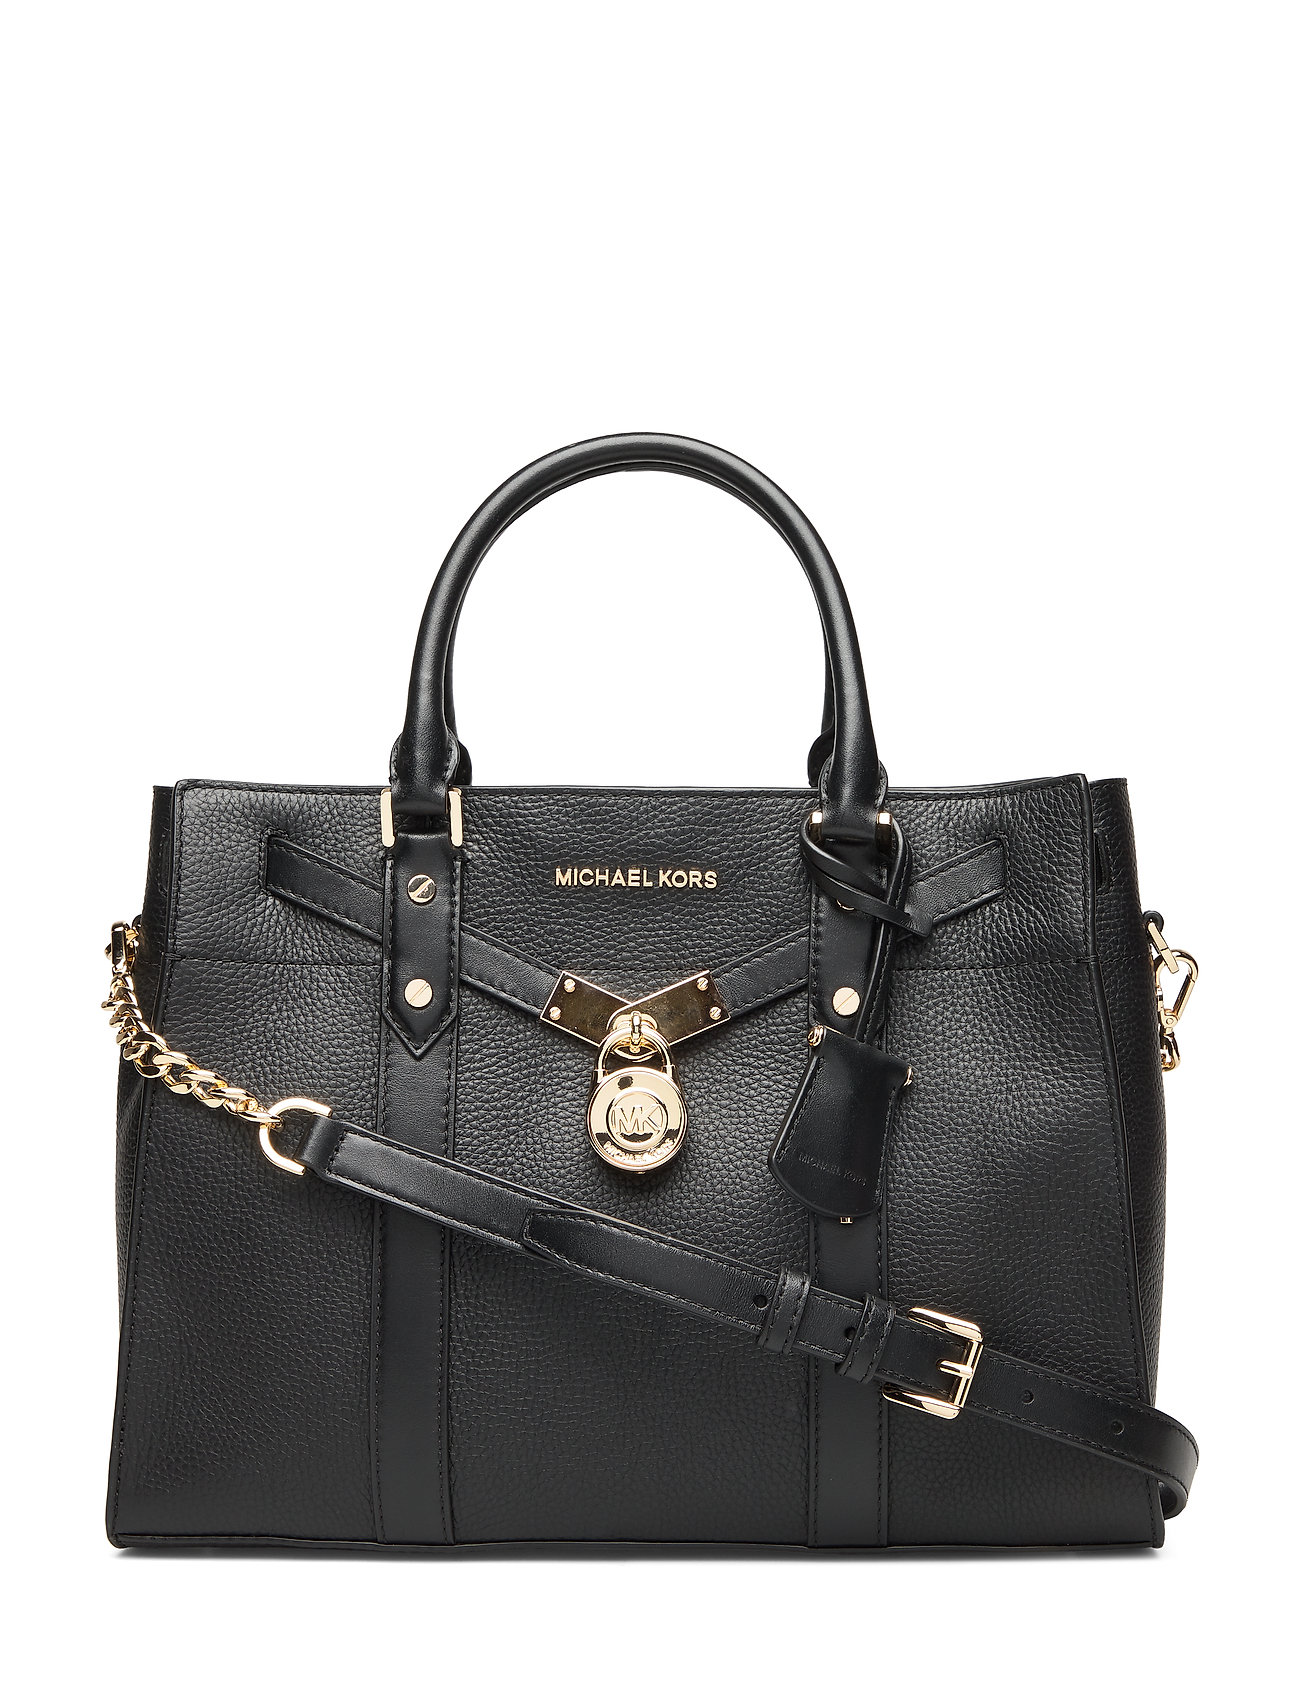 Michael Kors Bags LG SATCHEL - BLACK